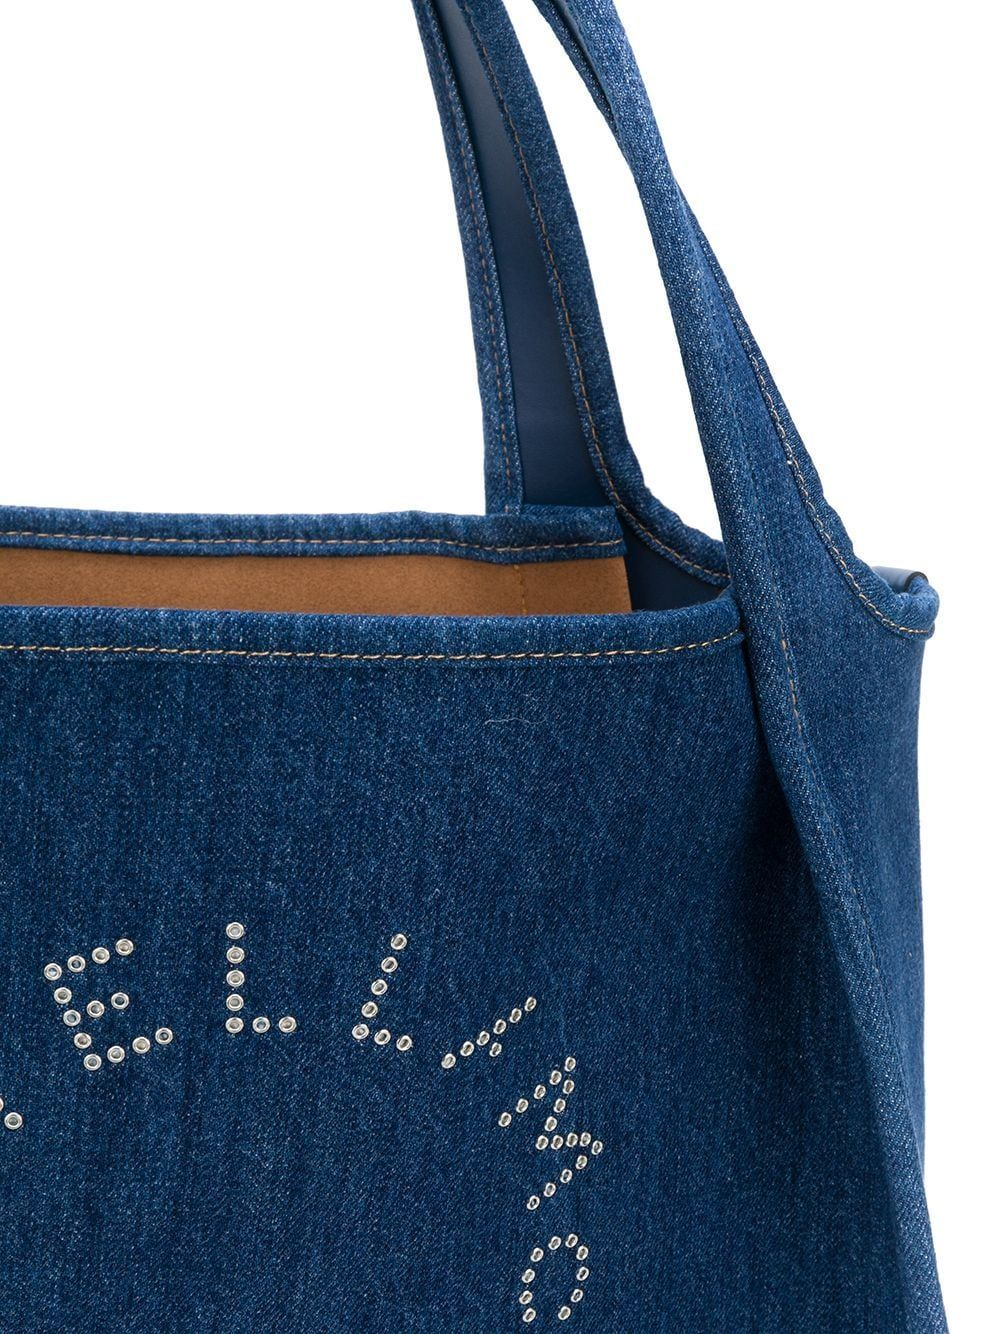 STELLA MCCARTNEY WOMEN'S 502793W86424324 BLUE FABRIC TOTE